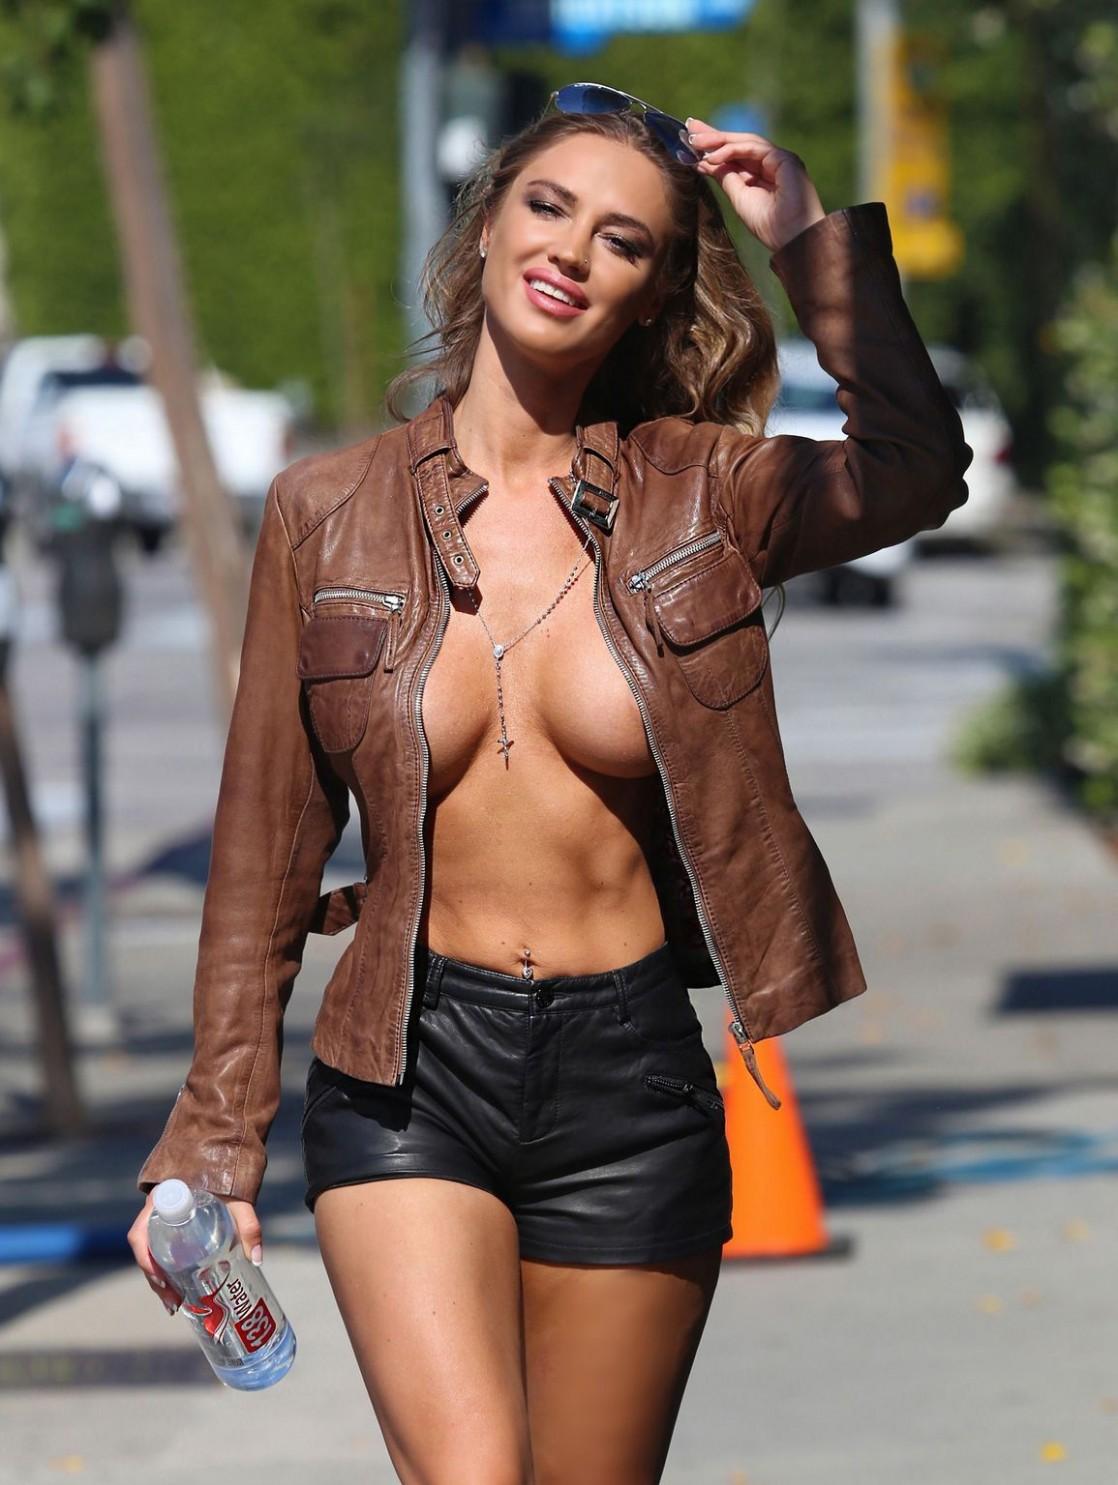 Nude women in leather bondage